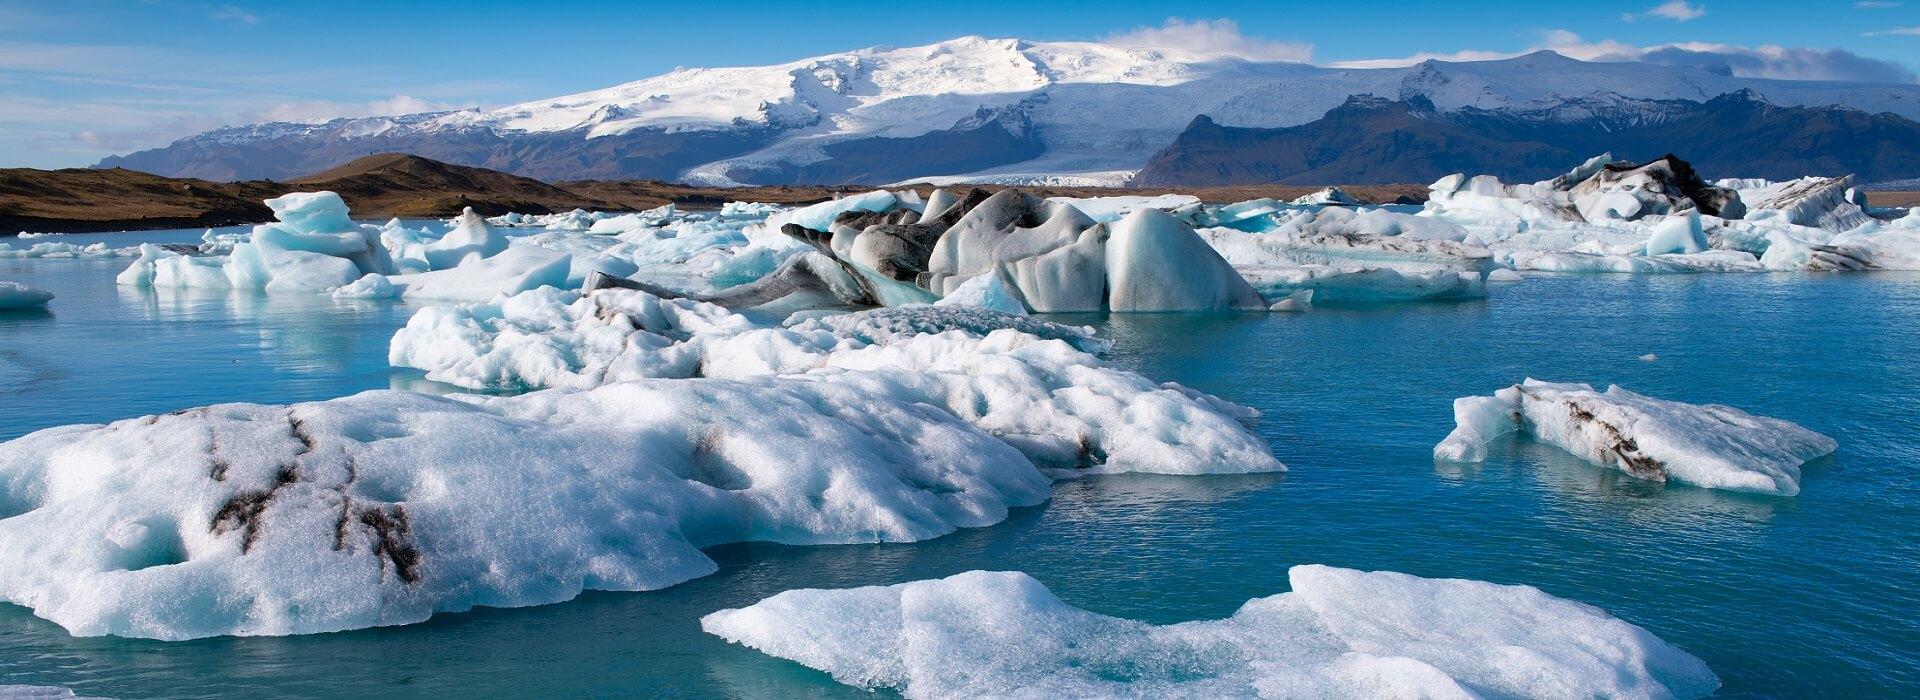 Jokuslarlon glacier lagoon, South Iceland